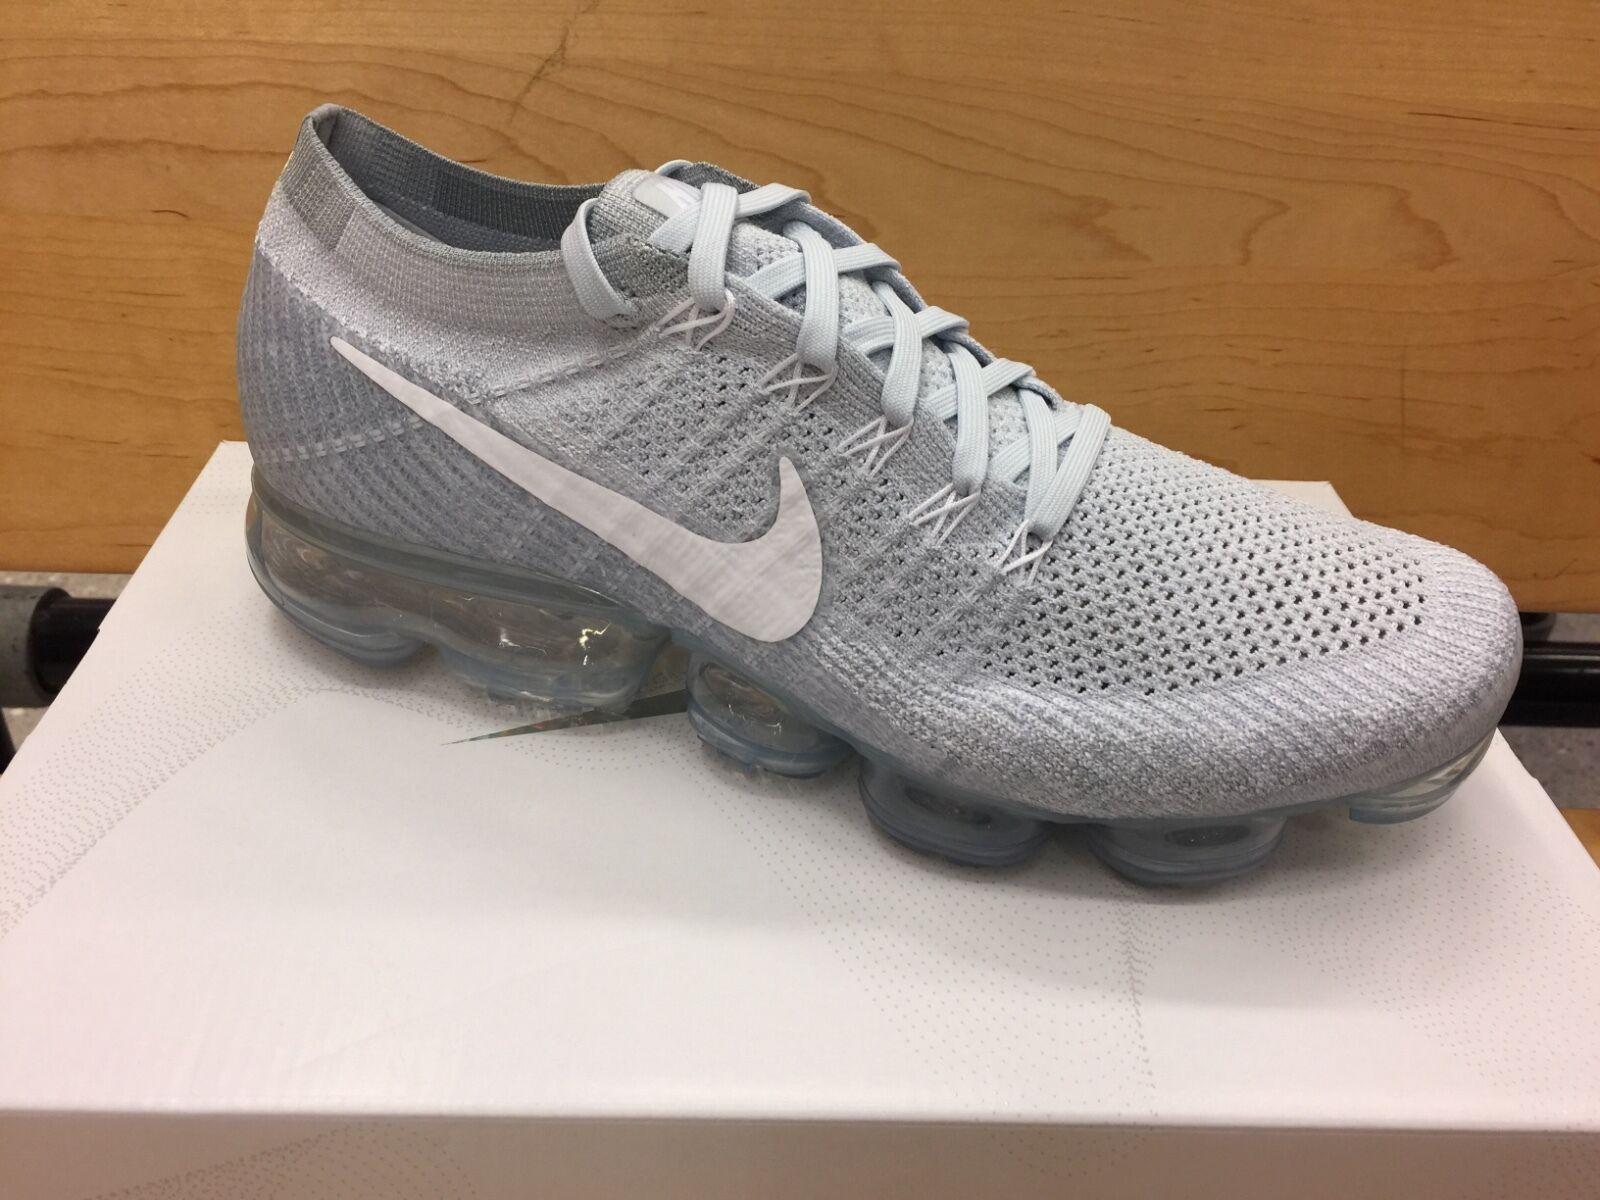 Nike air max vapore giorno va in onda tutti 90 95 1 nero infrarossi og flyknit 97 98